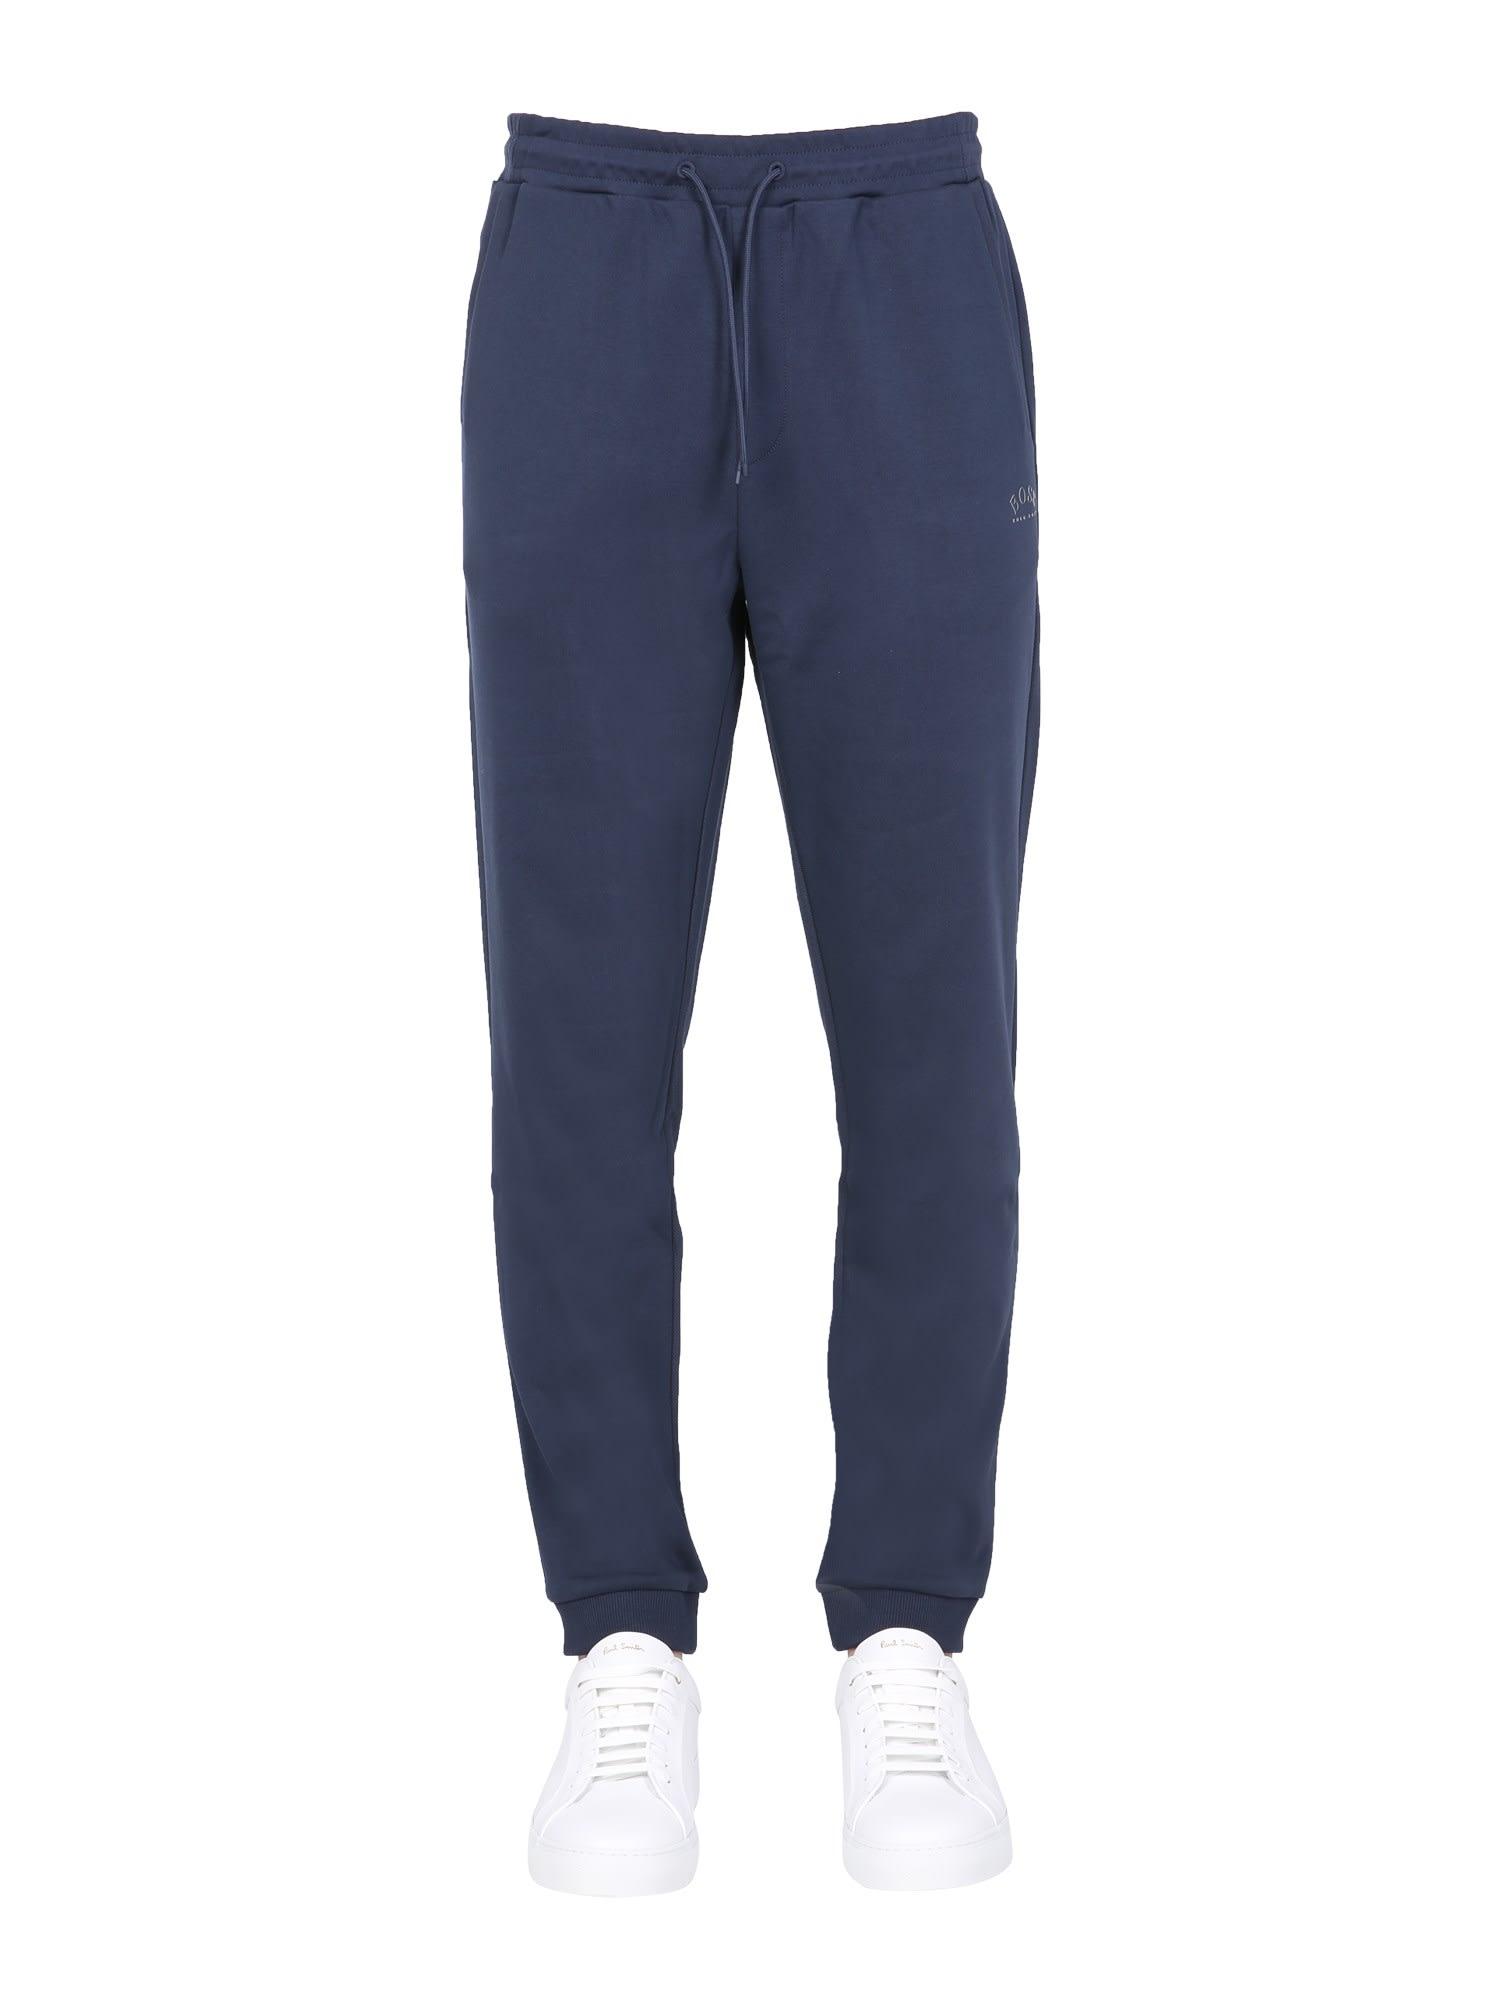 Hugo Boss Jogging Pants